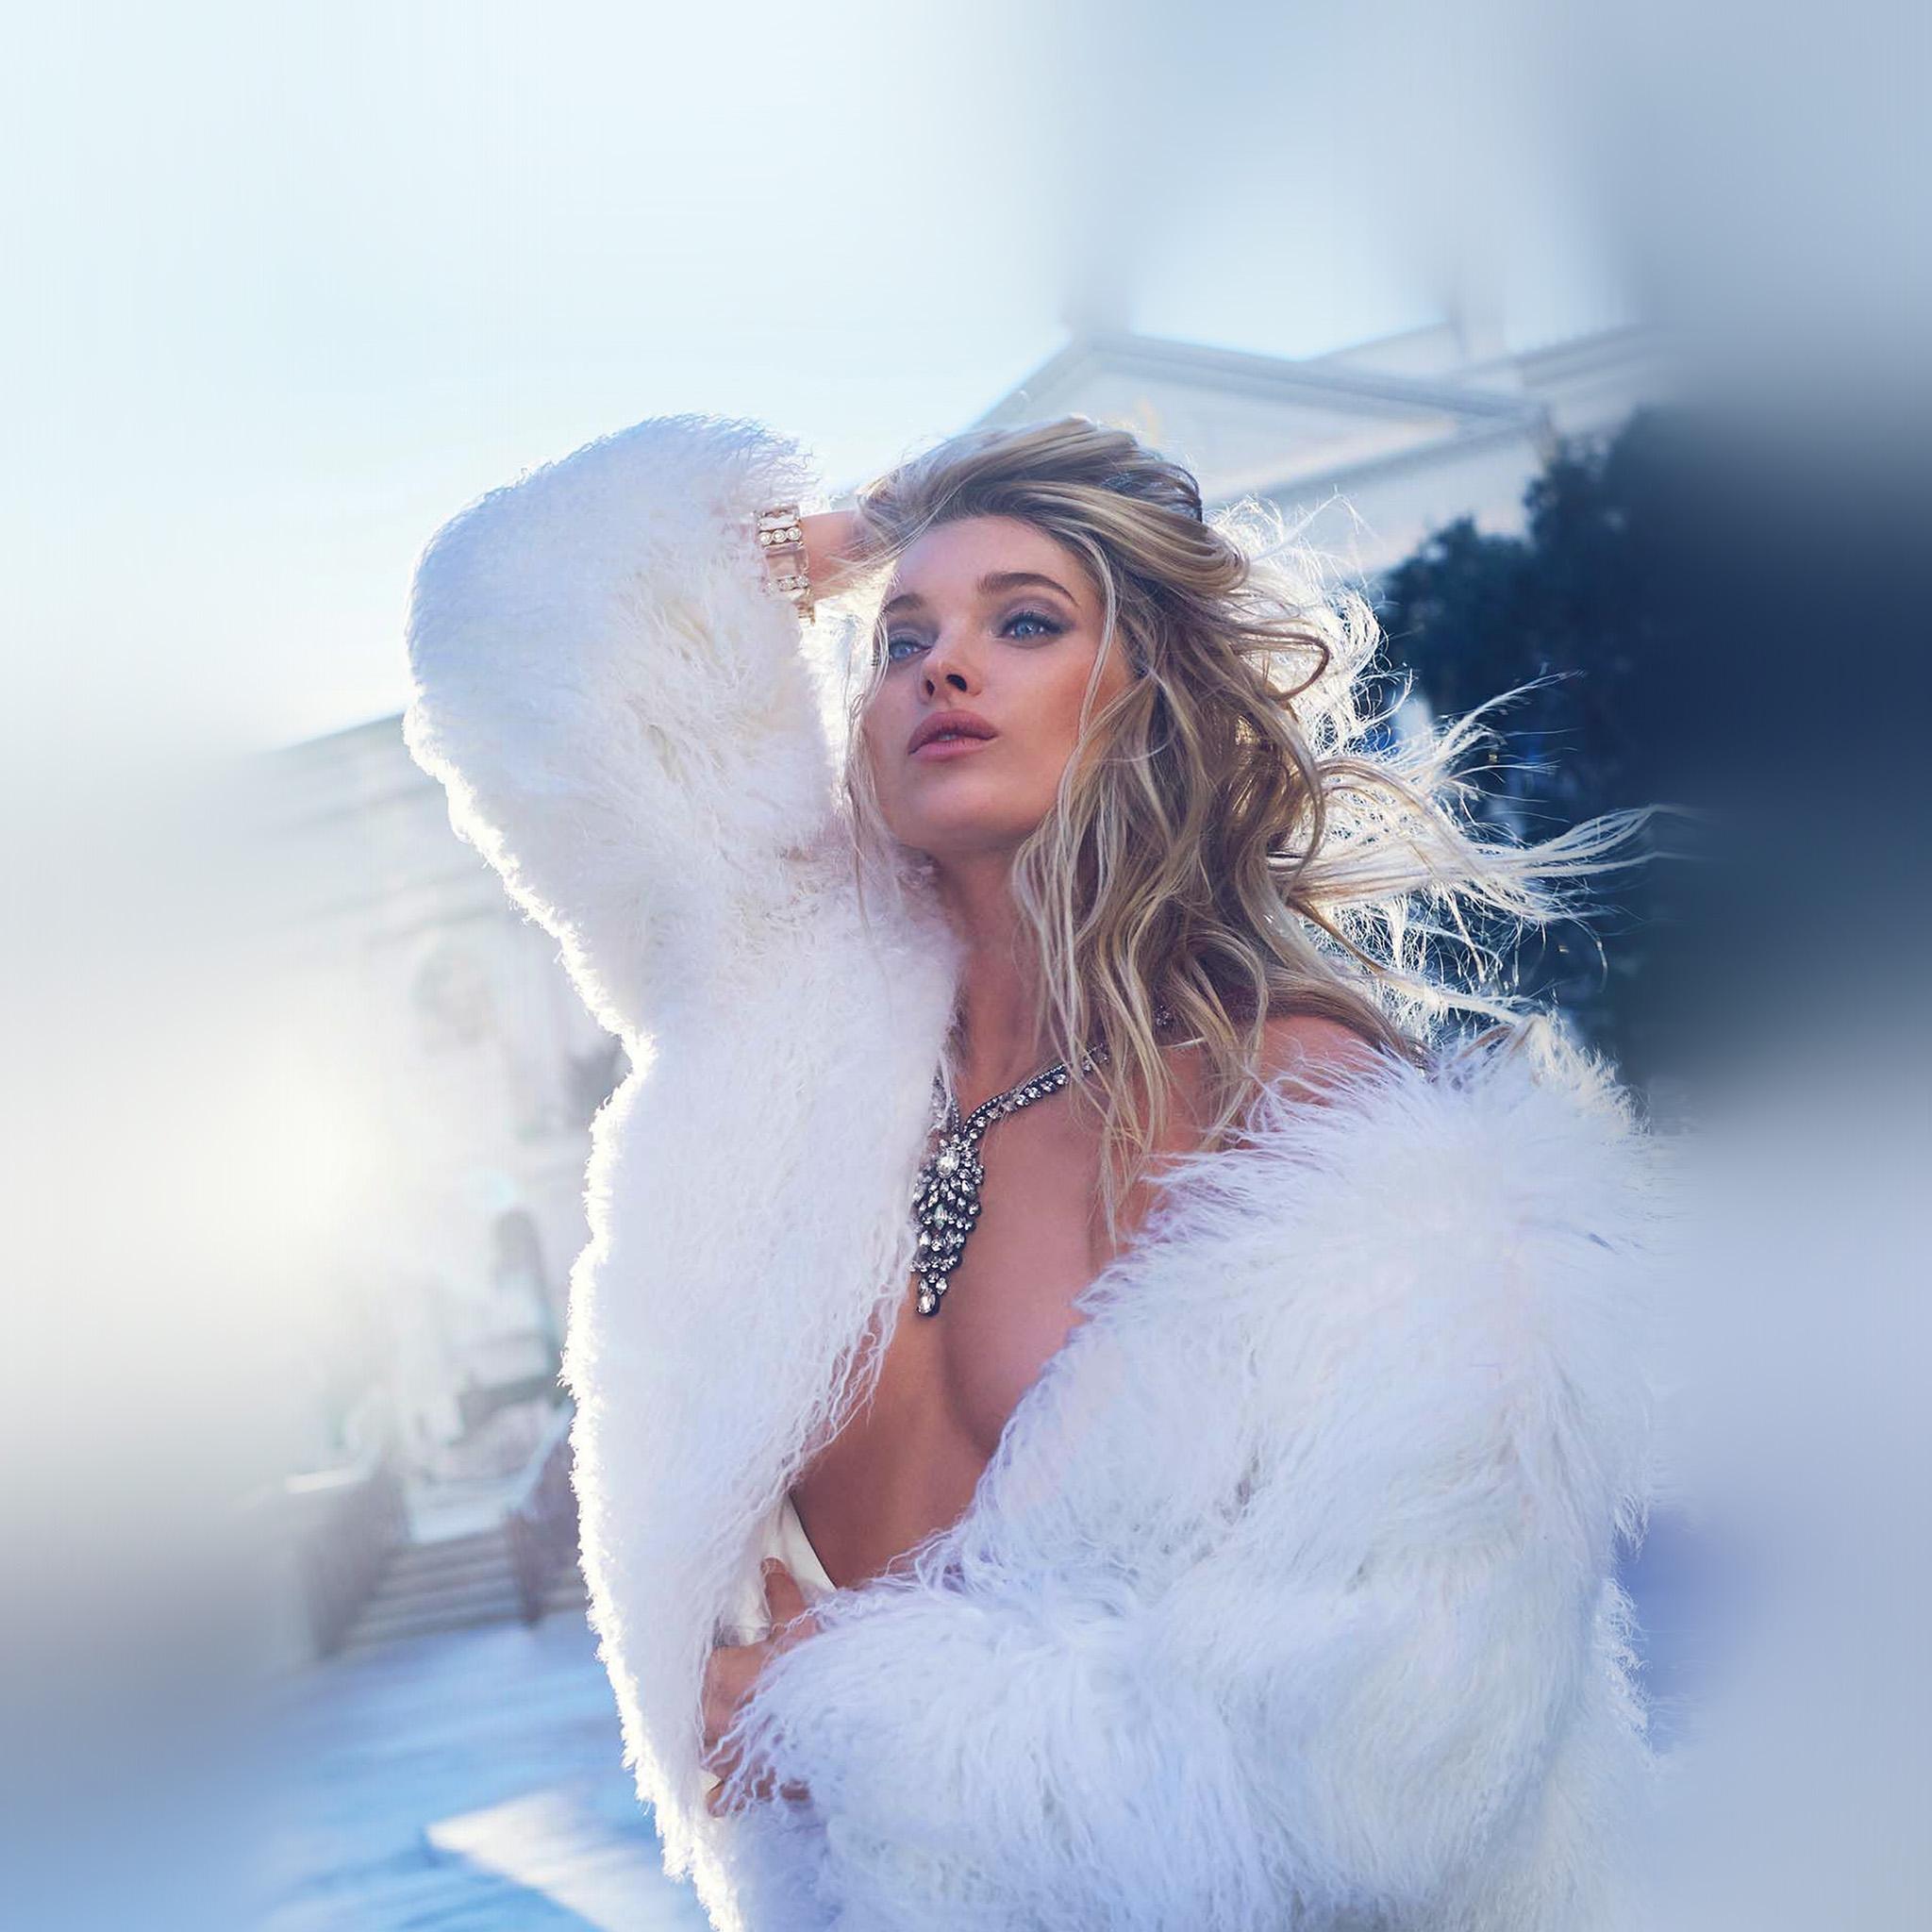 Hp26-girl-model-winter-sexy-wallpaper